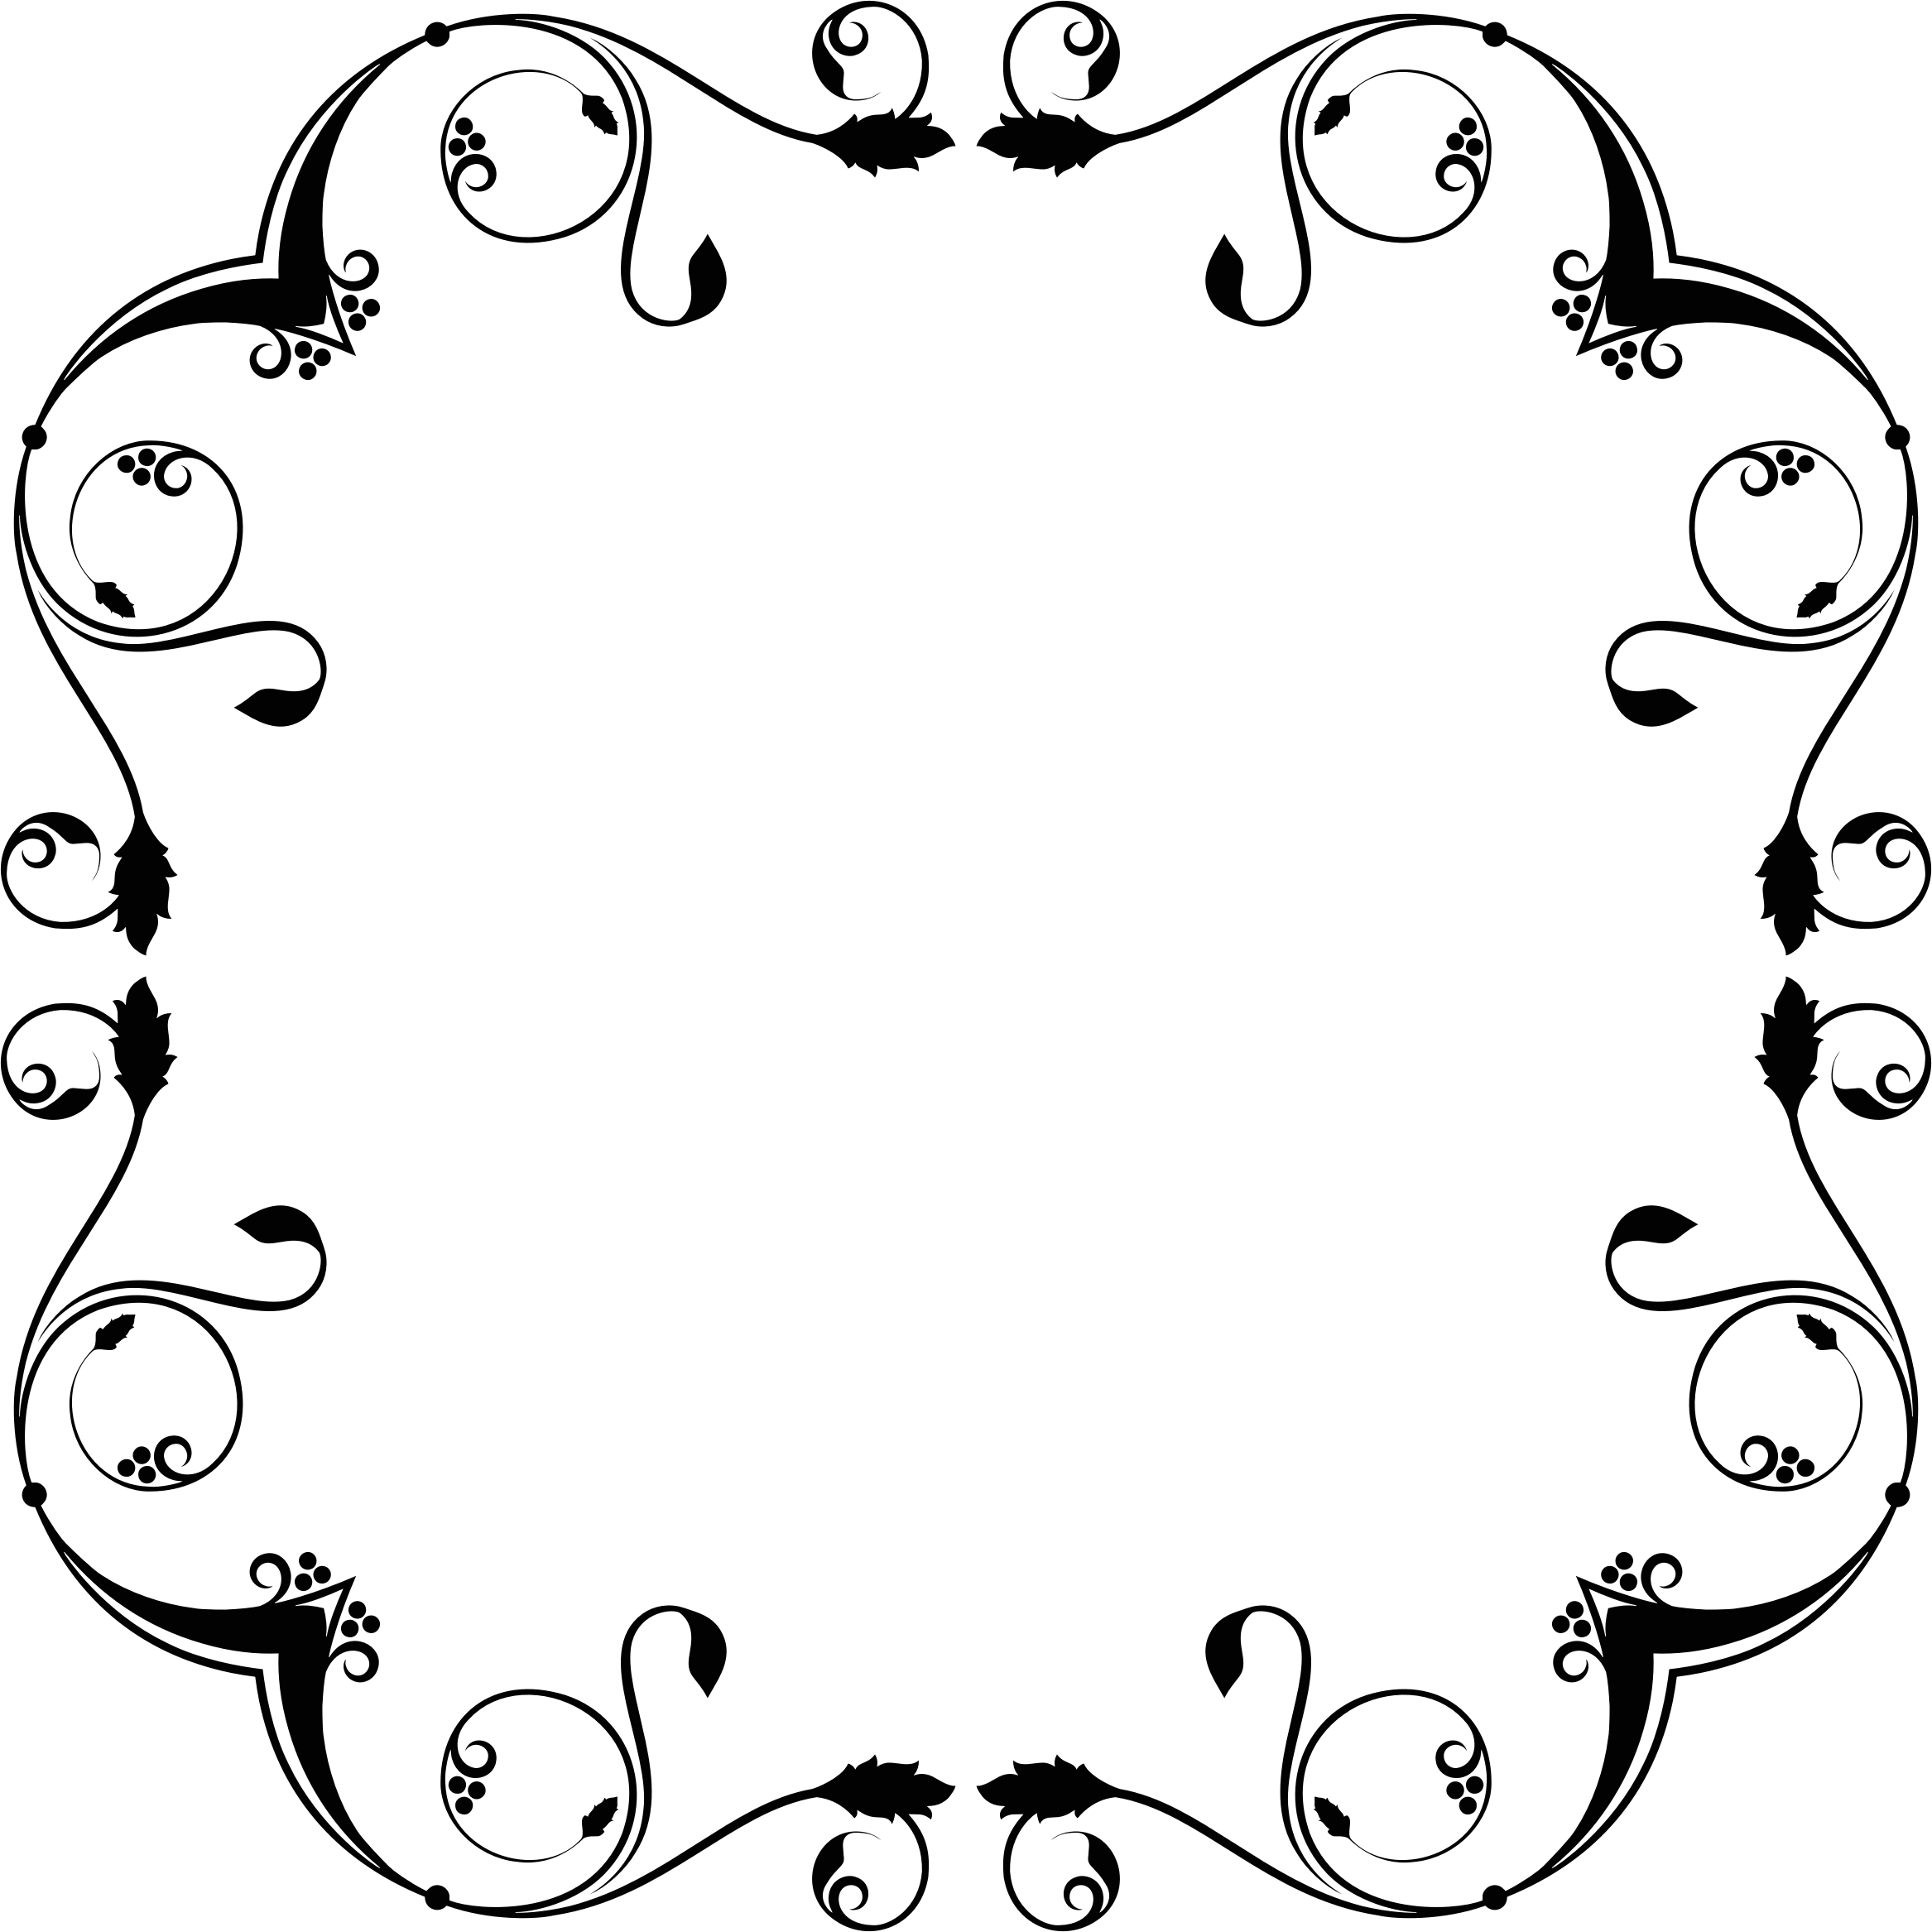 Clipart - Flourish Frame Design